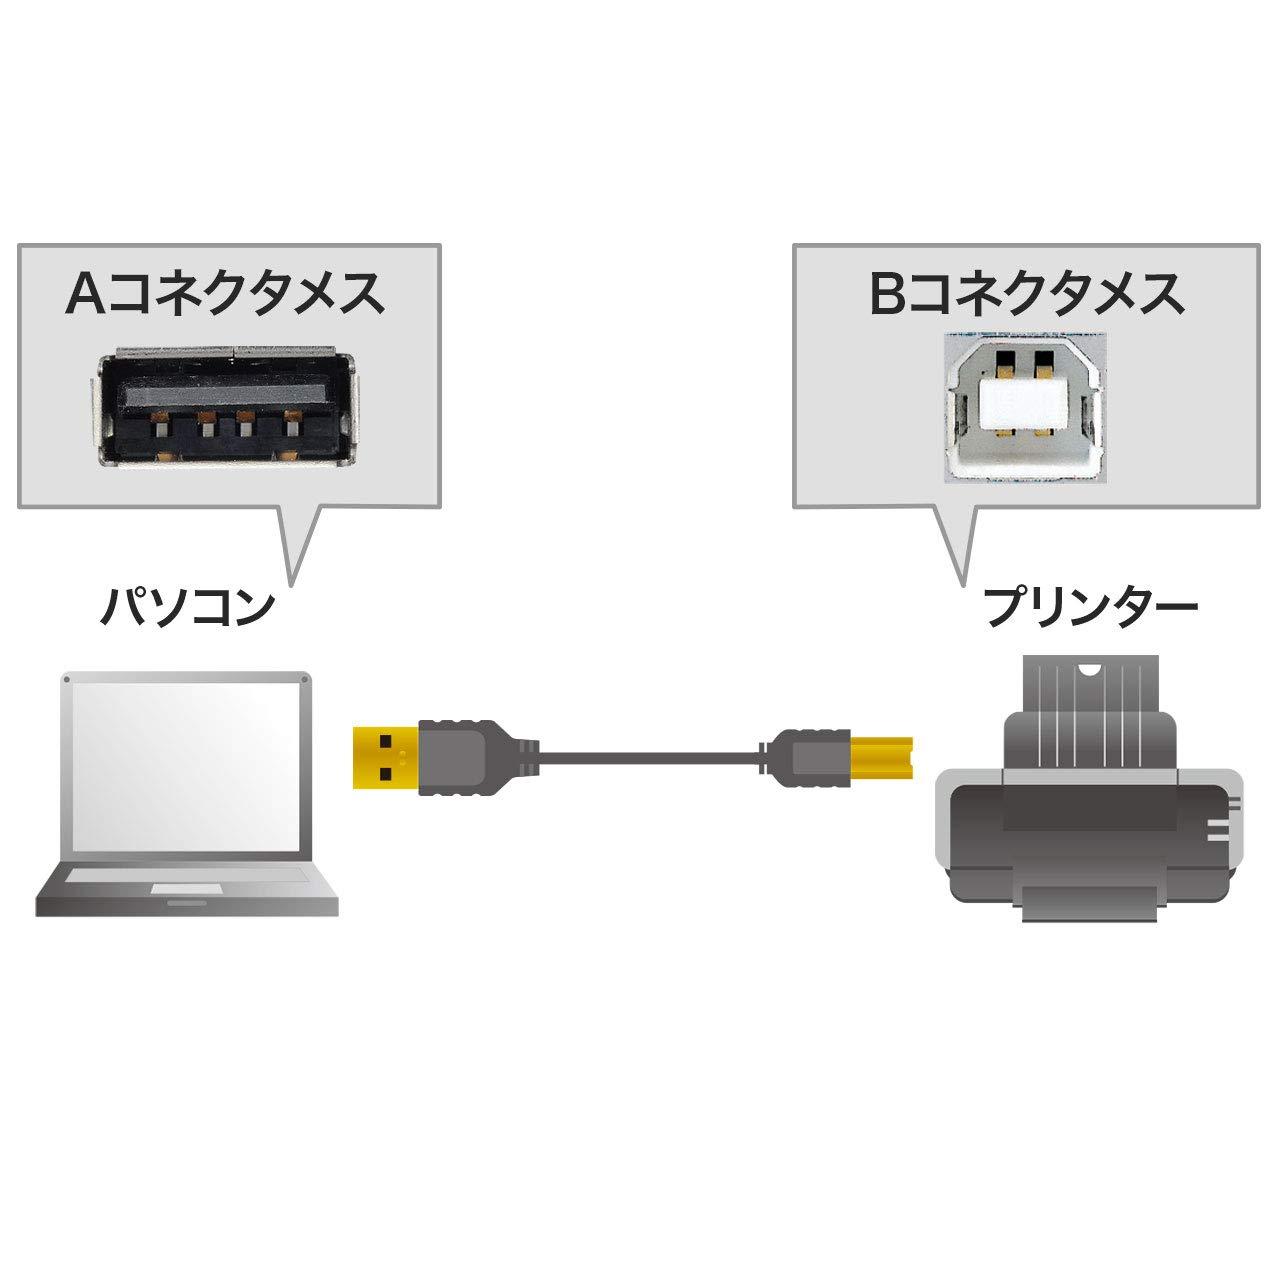 SANWA Superfine USB Cable Black 1.5m KU20-SL15BK USB2.0 A-B Type